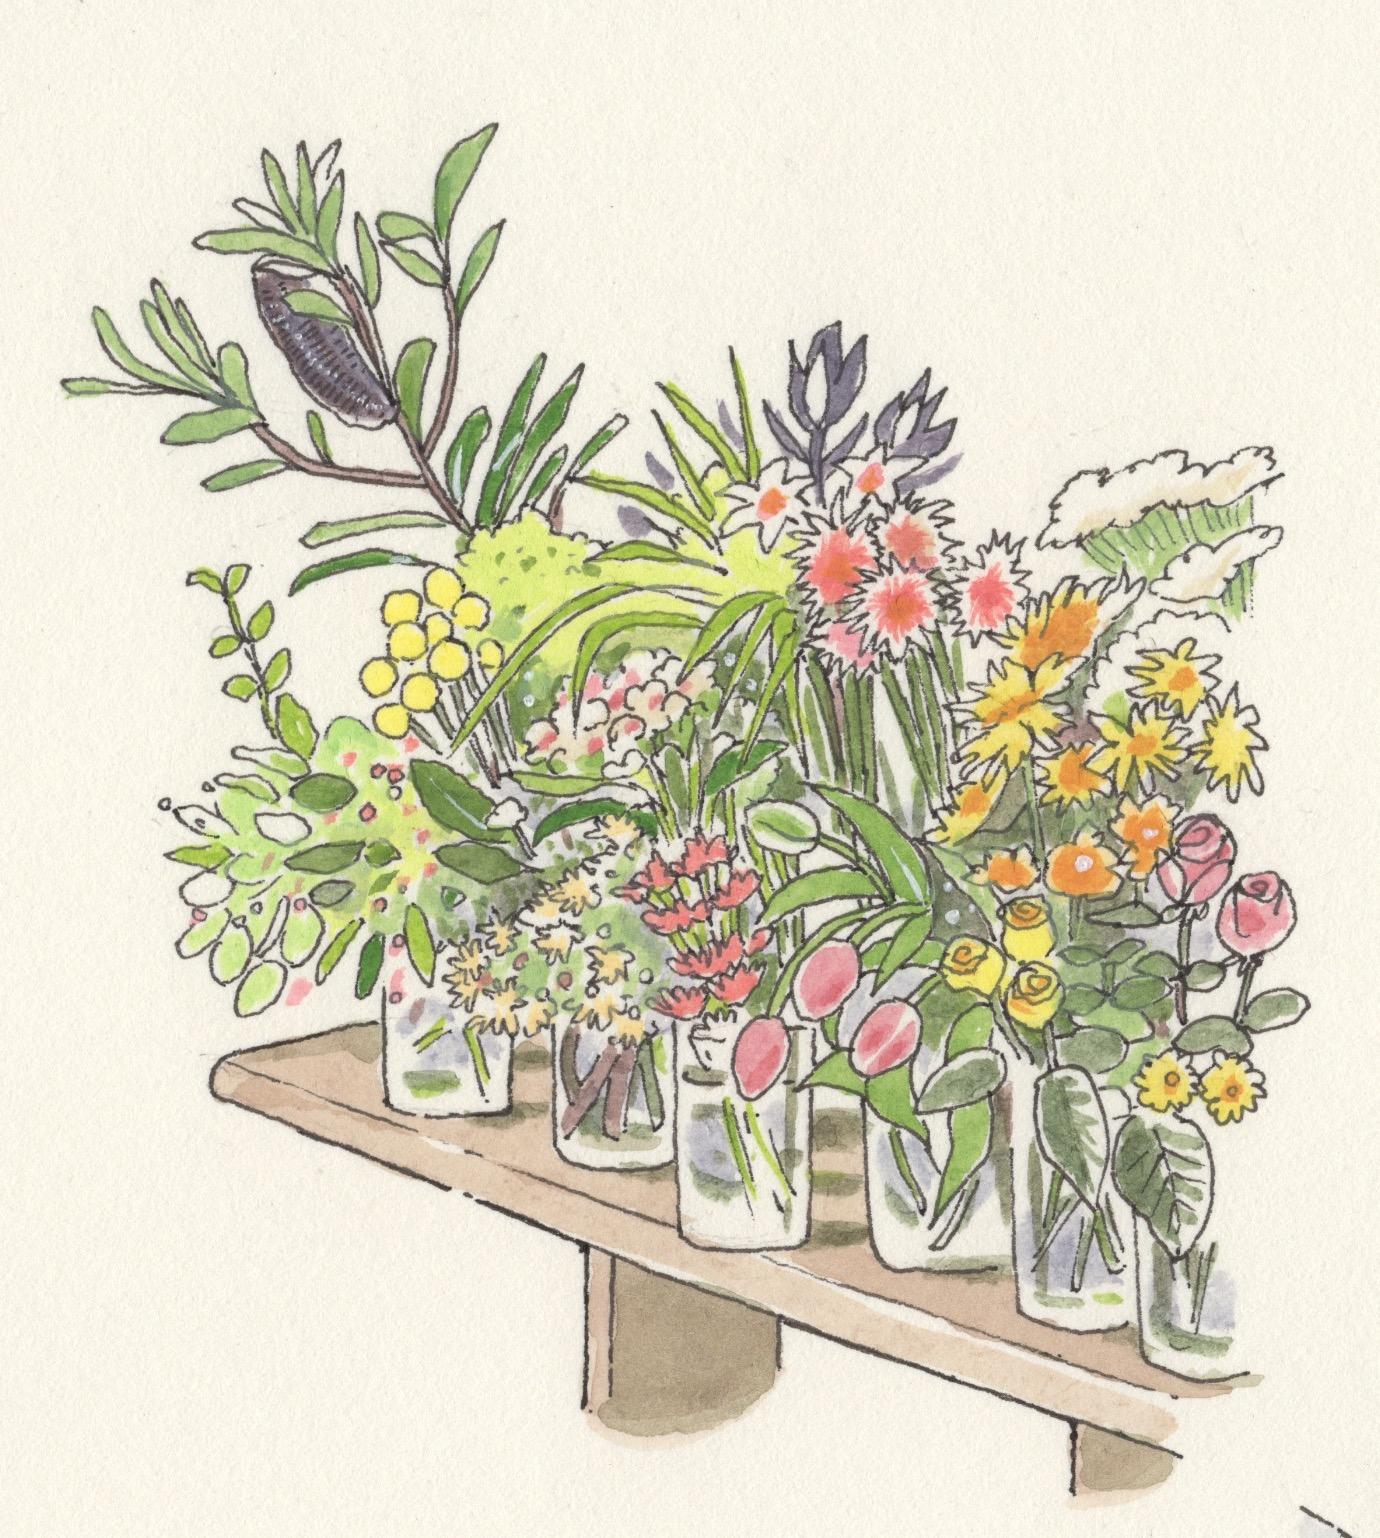 代々木上原、ex.flower shop & laboratory